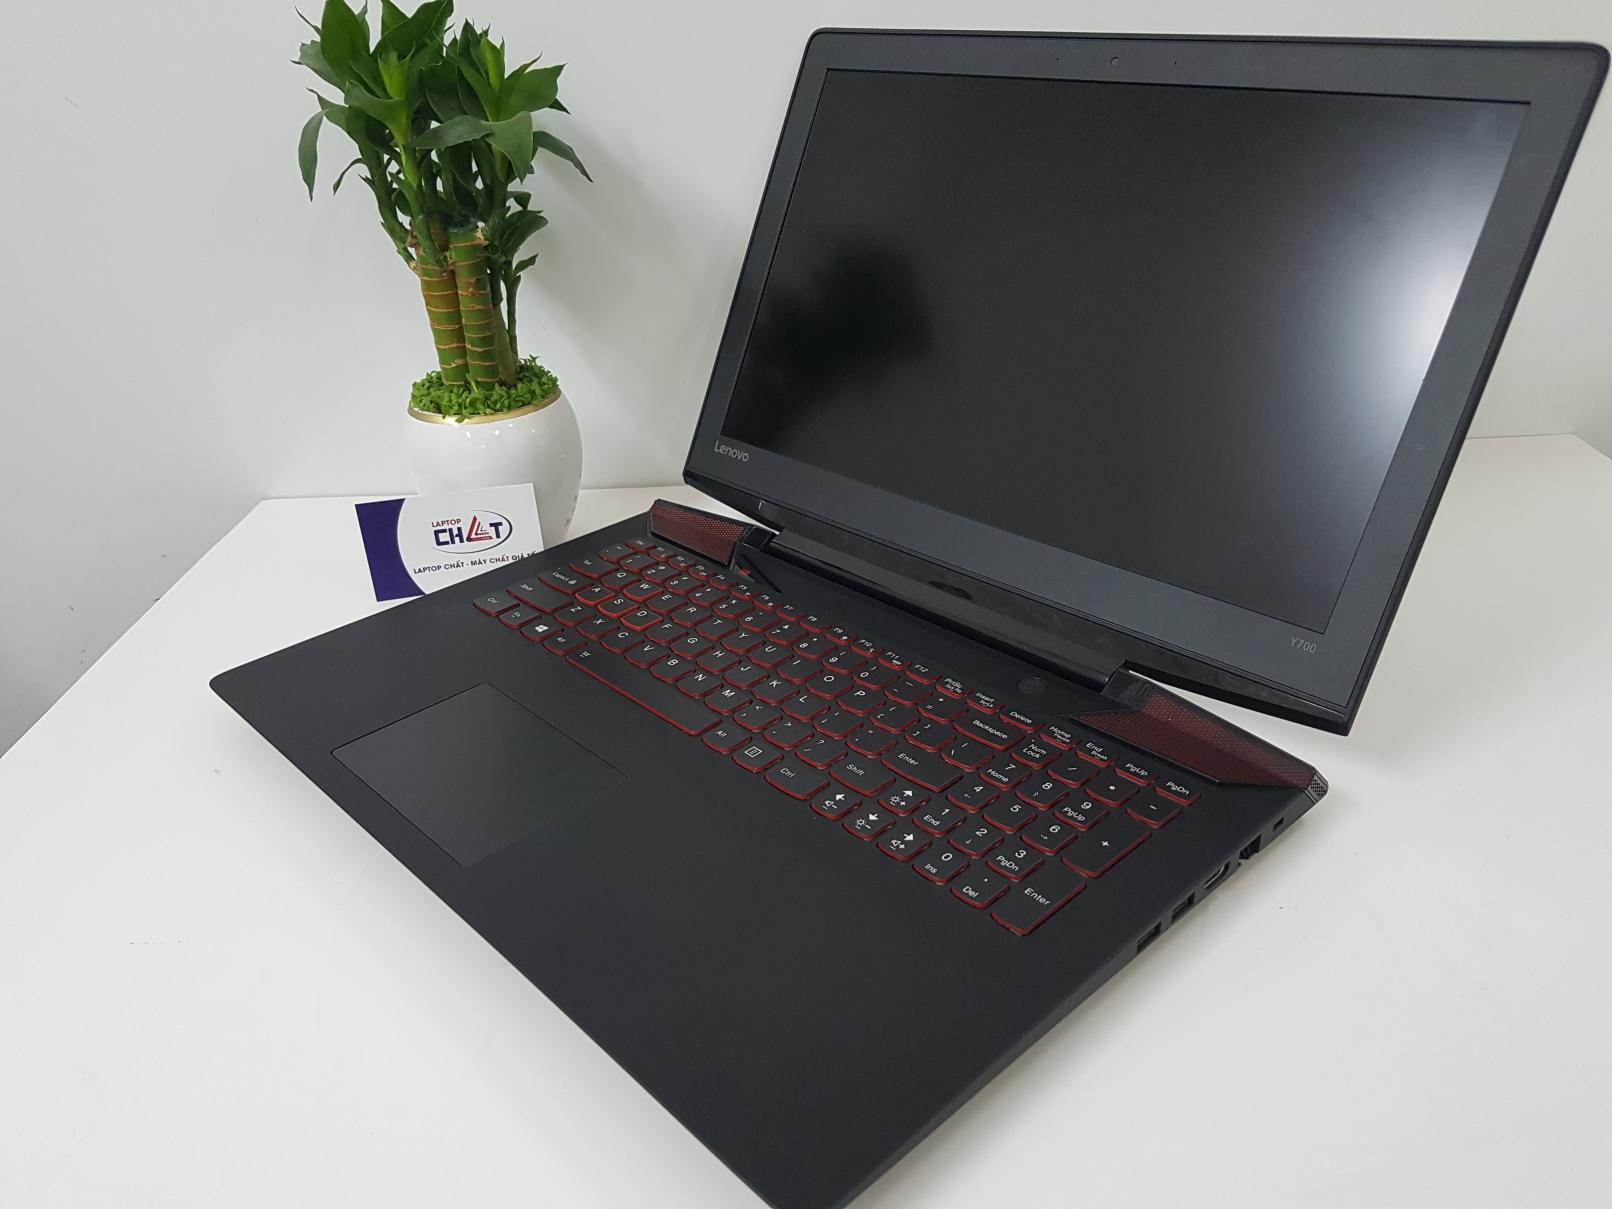 Lenovo Y700 ISK-3